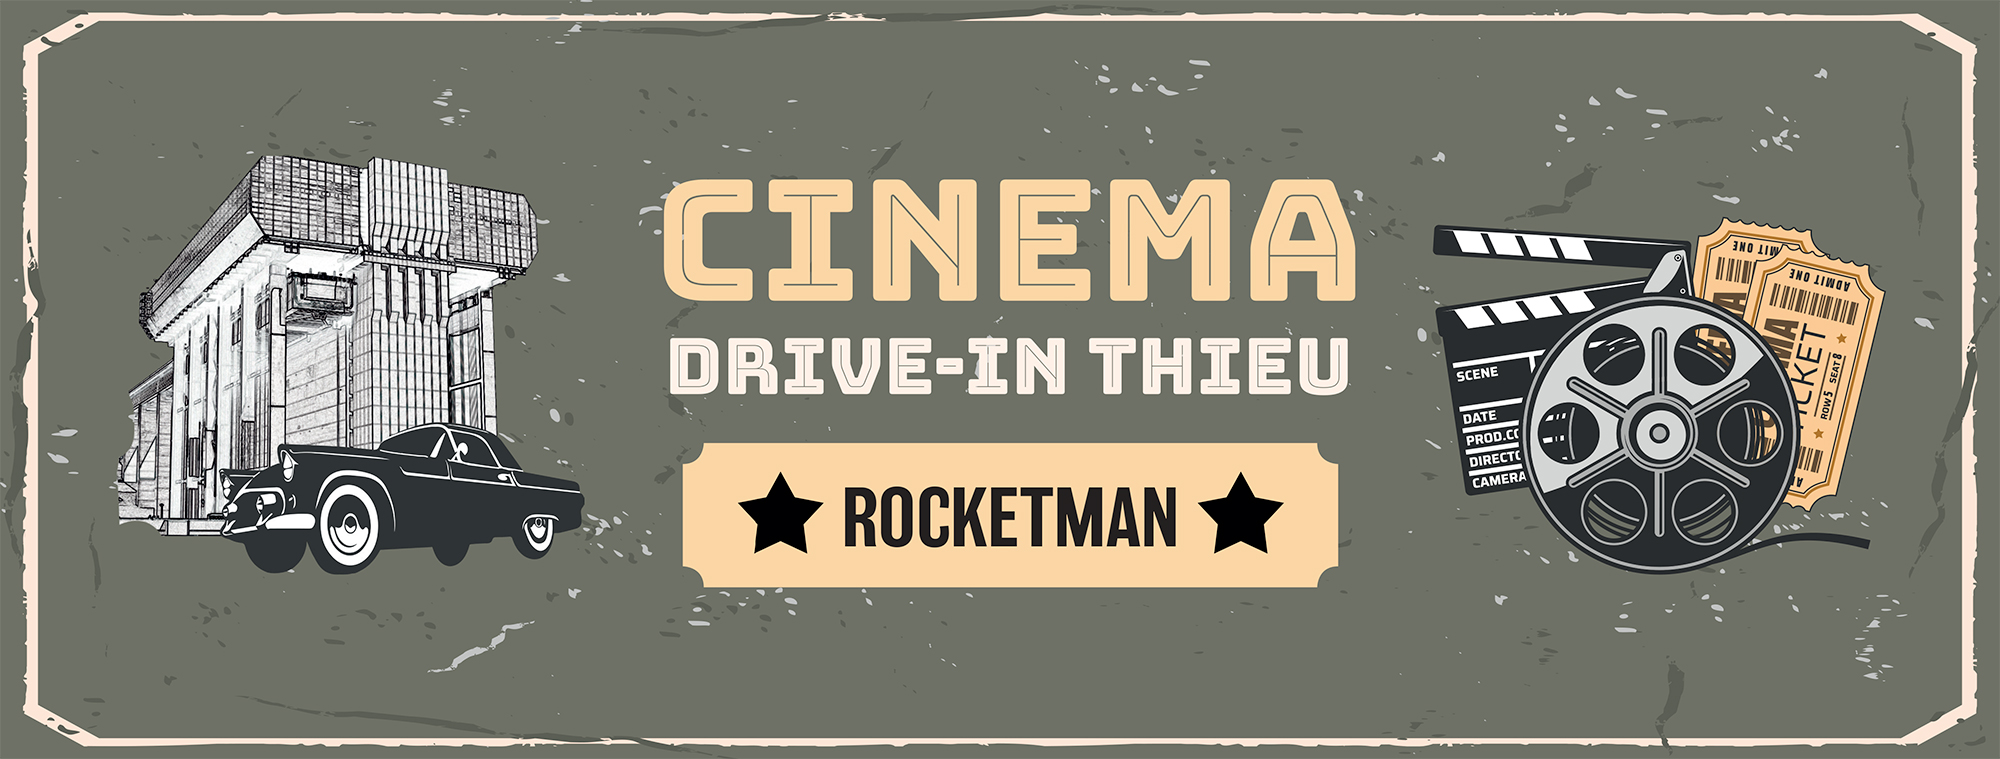 Banner-site-cinema-drive-in-Thieu-2.jpg